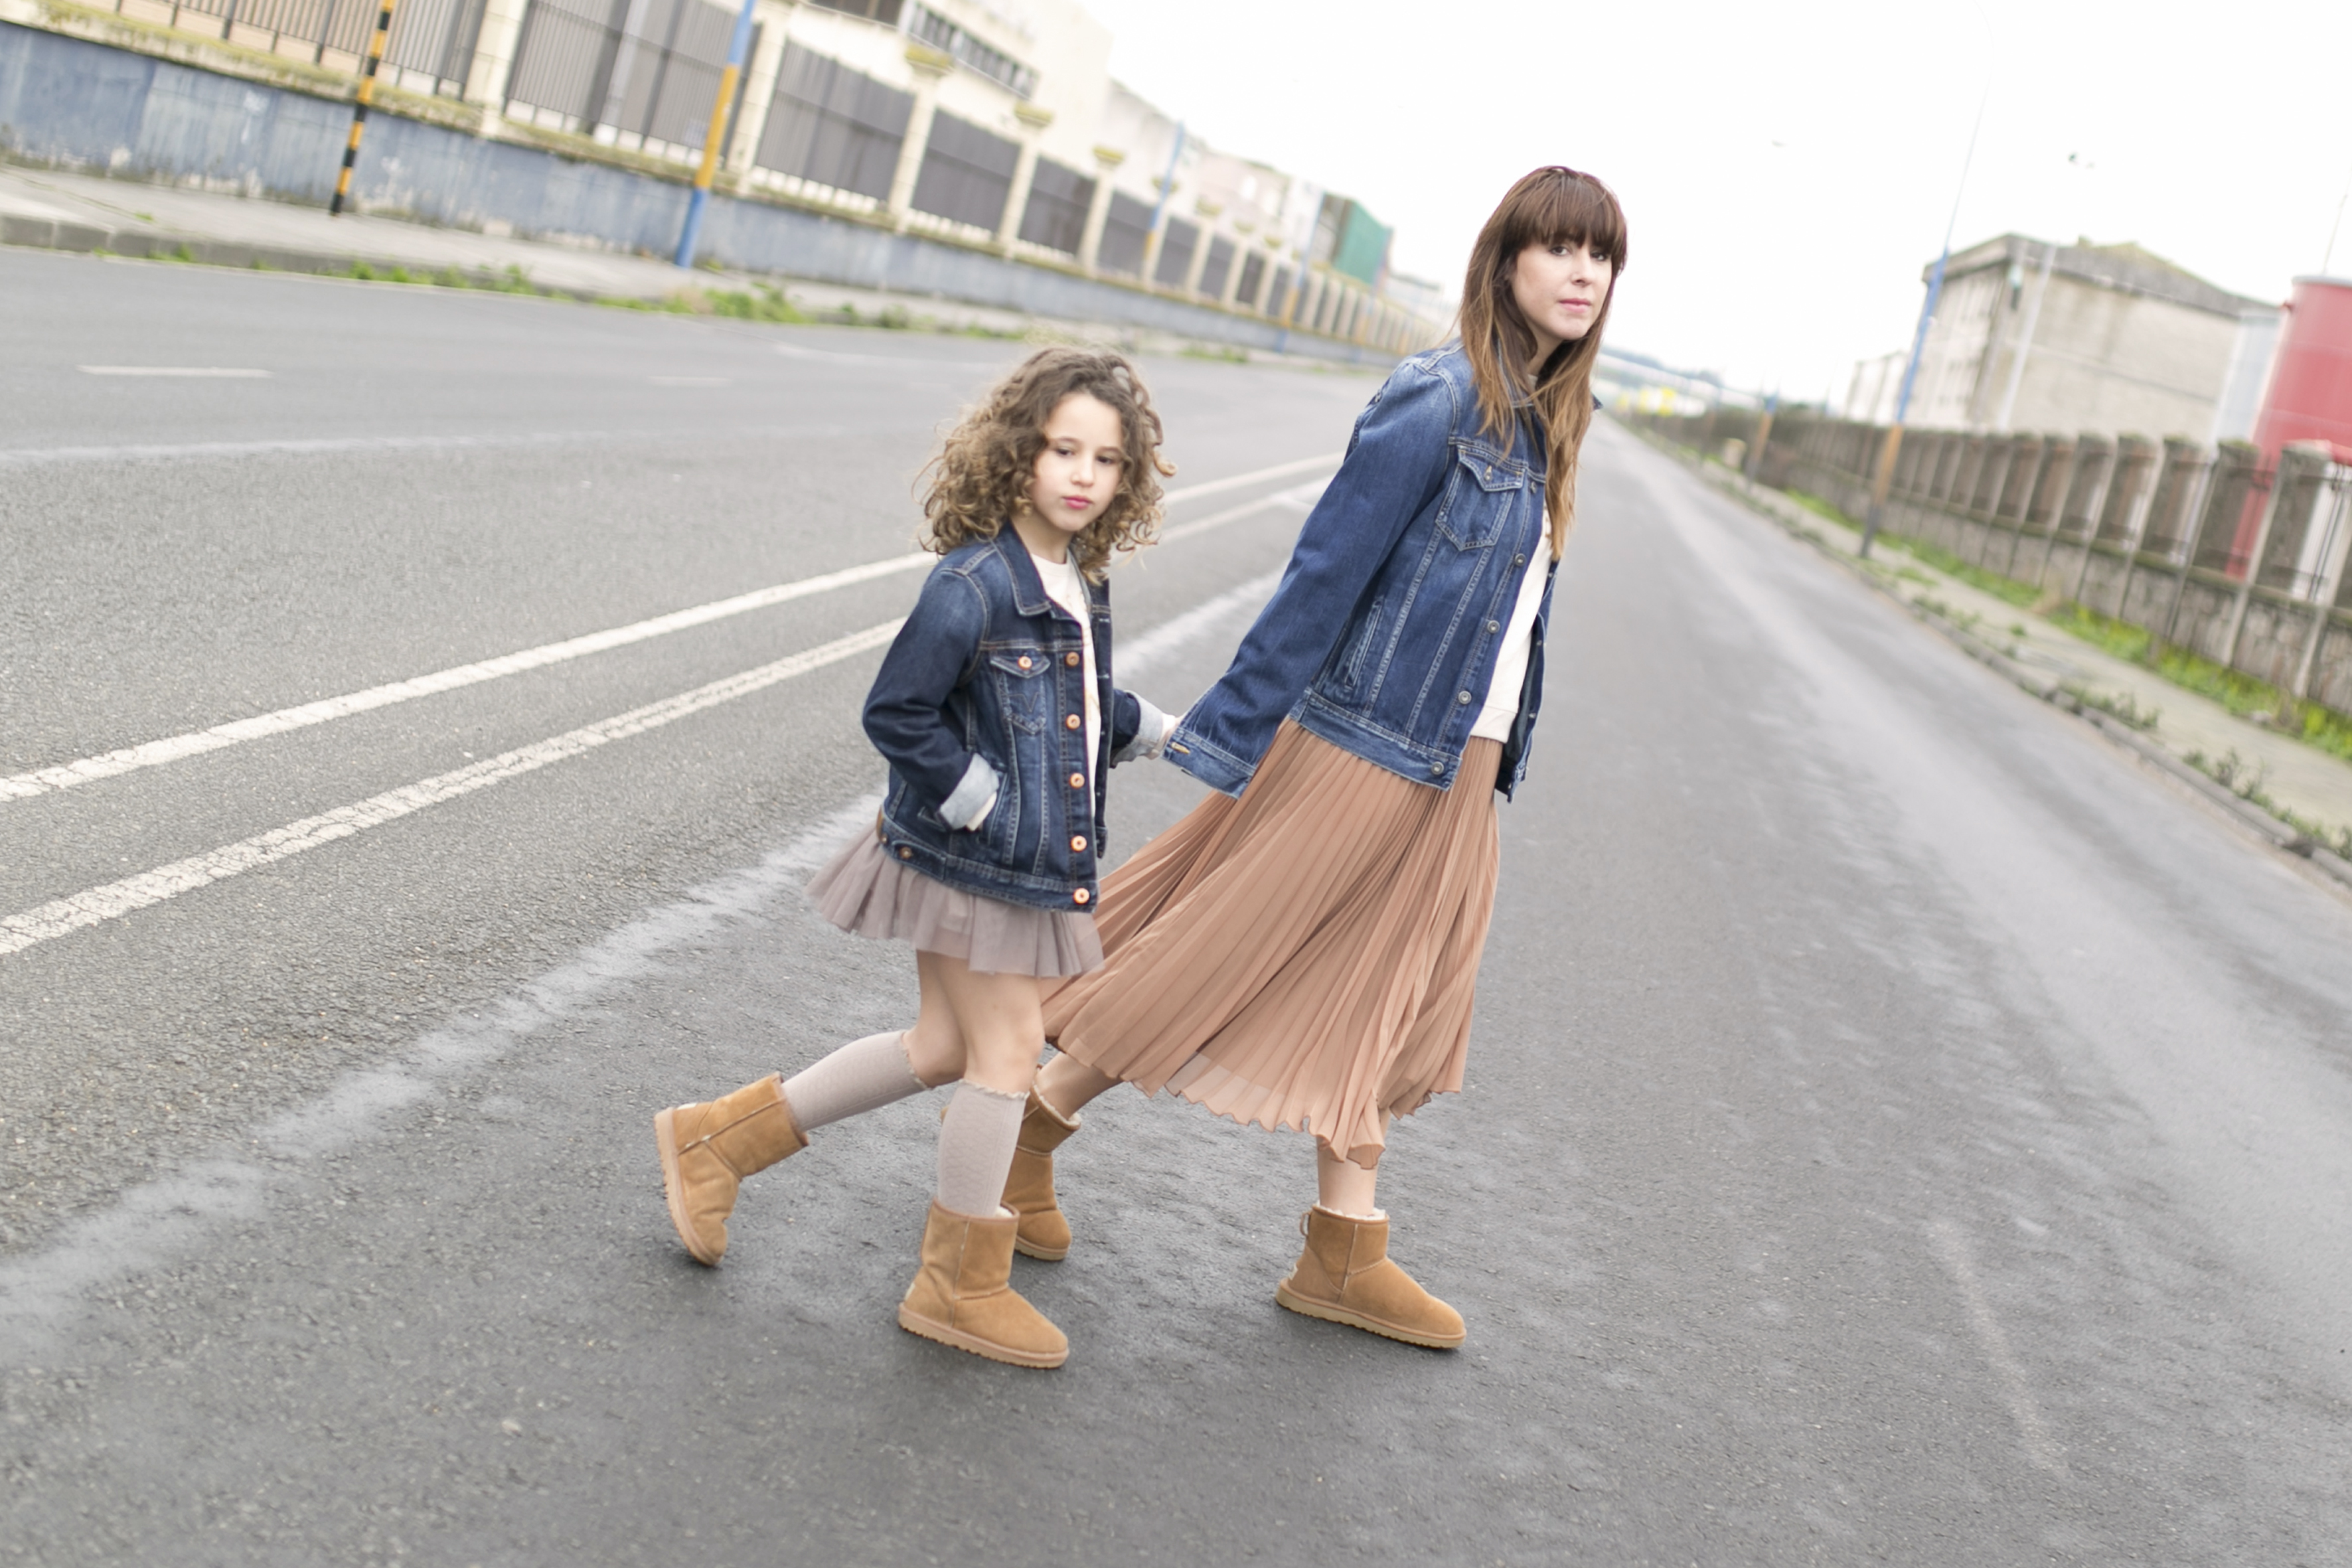 Ugg- coruña-calle-estylo-madre e hija-zara- zarakids- street style- descalzaporelparque-Ugg look-denim-pepejeans-minime